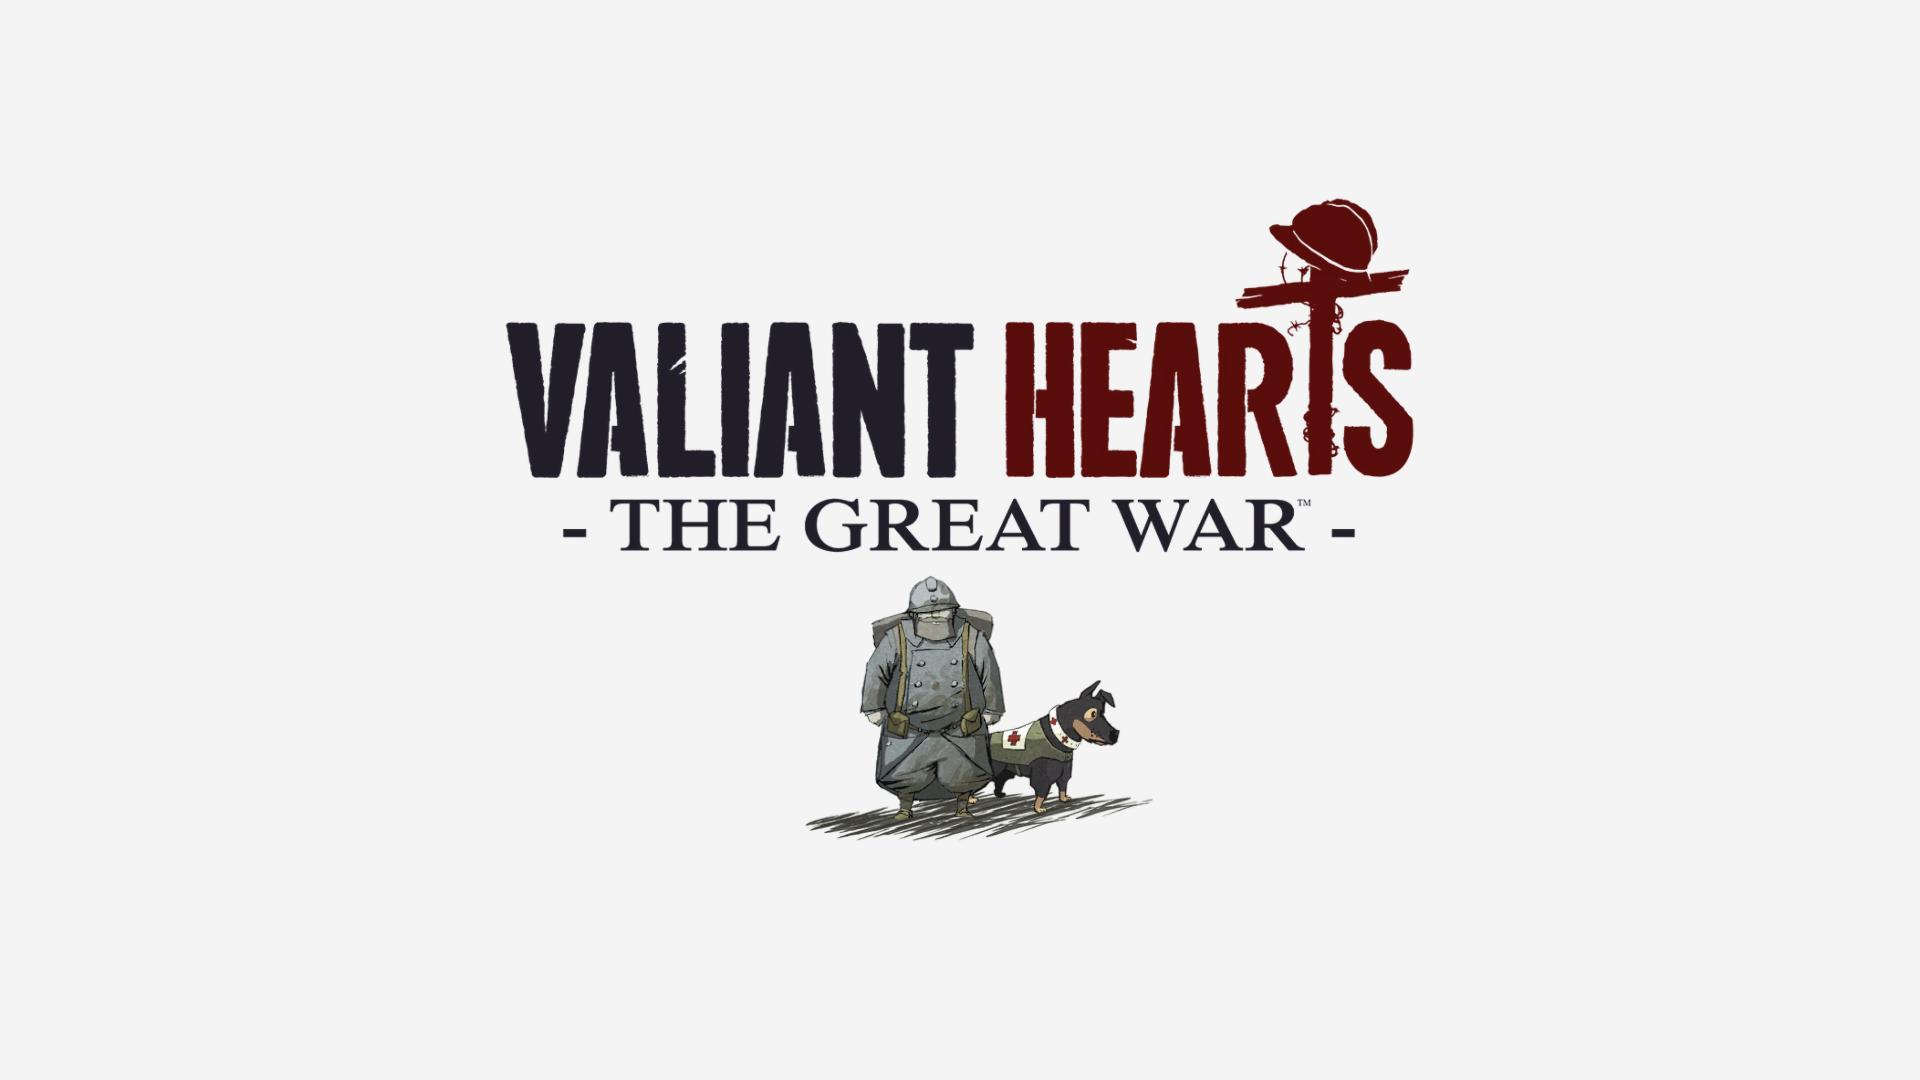 valiant hearts the great war обои на рабочий стол 1920х1080 № 734 бесплатно